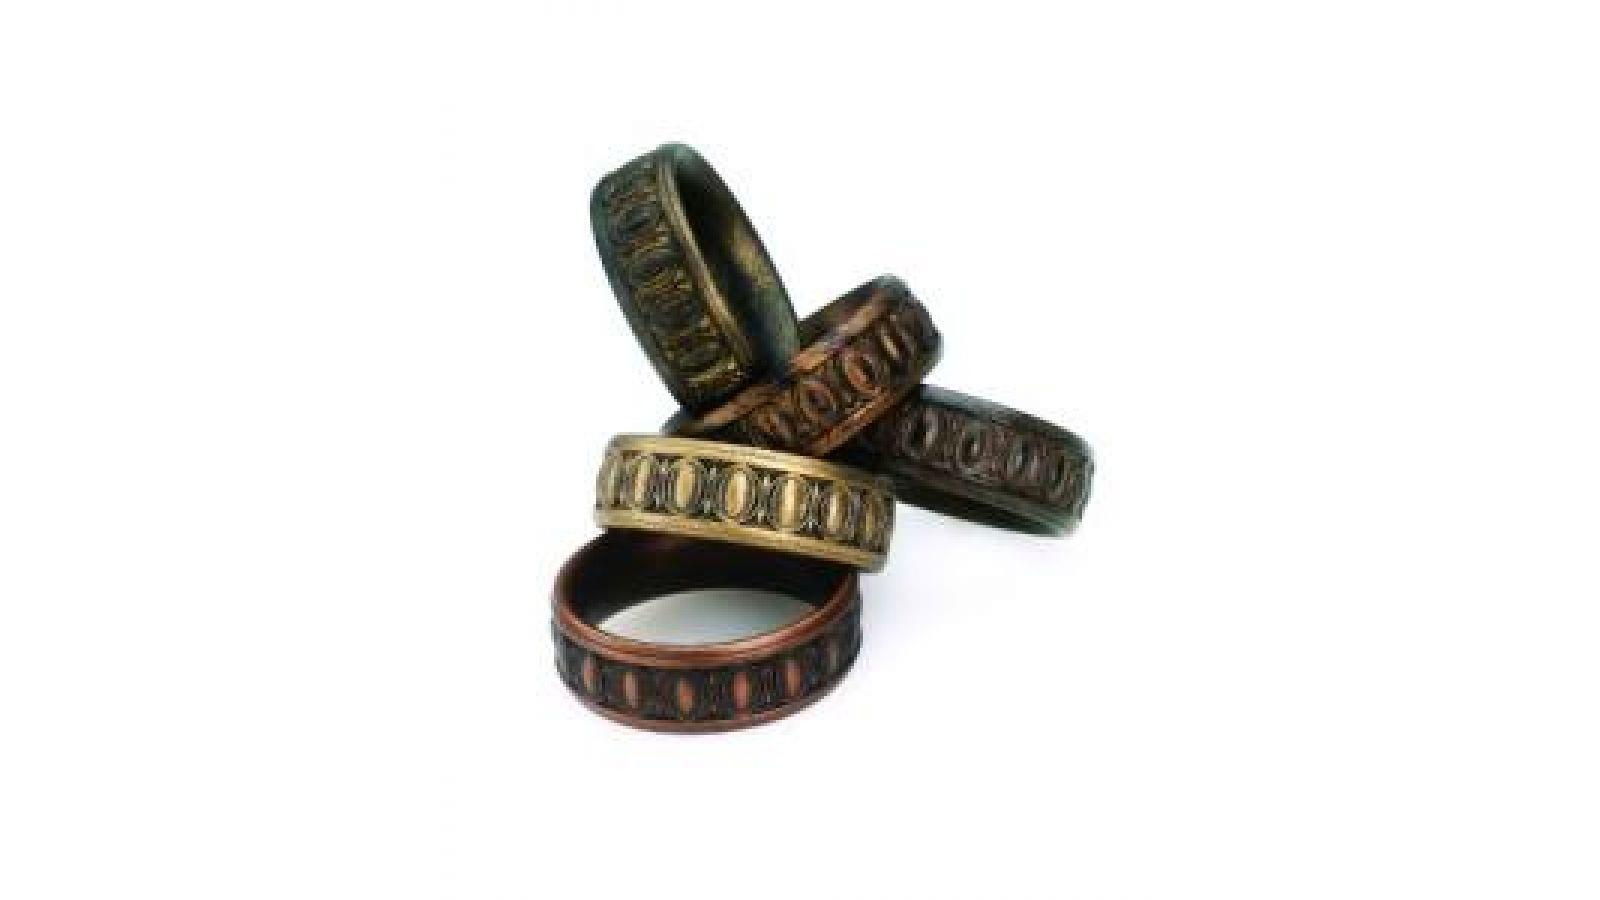 KIWood Trends2 Renaissance Rings